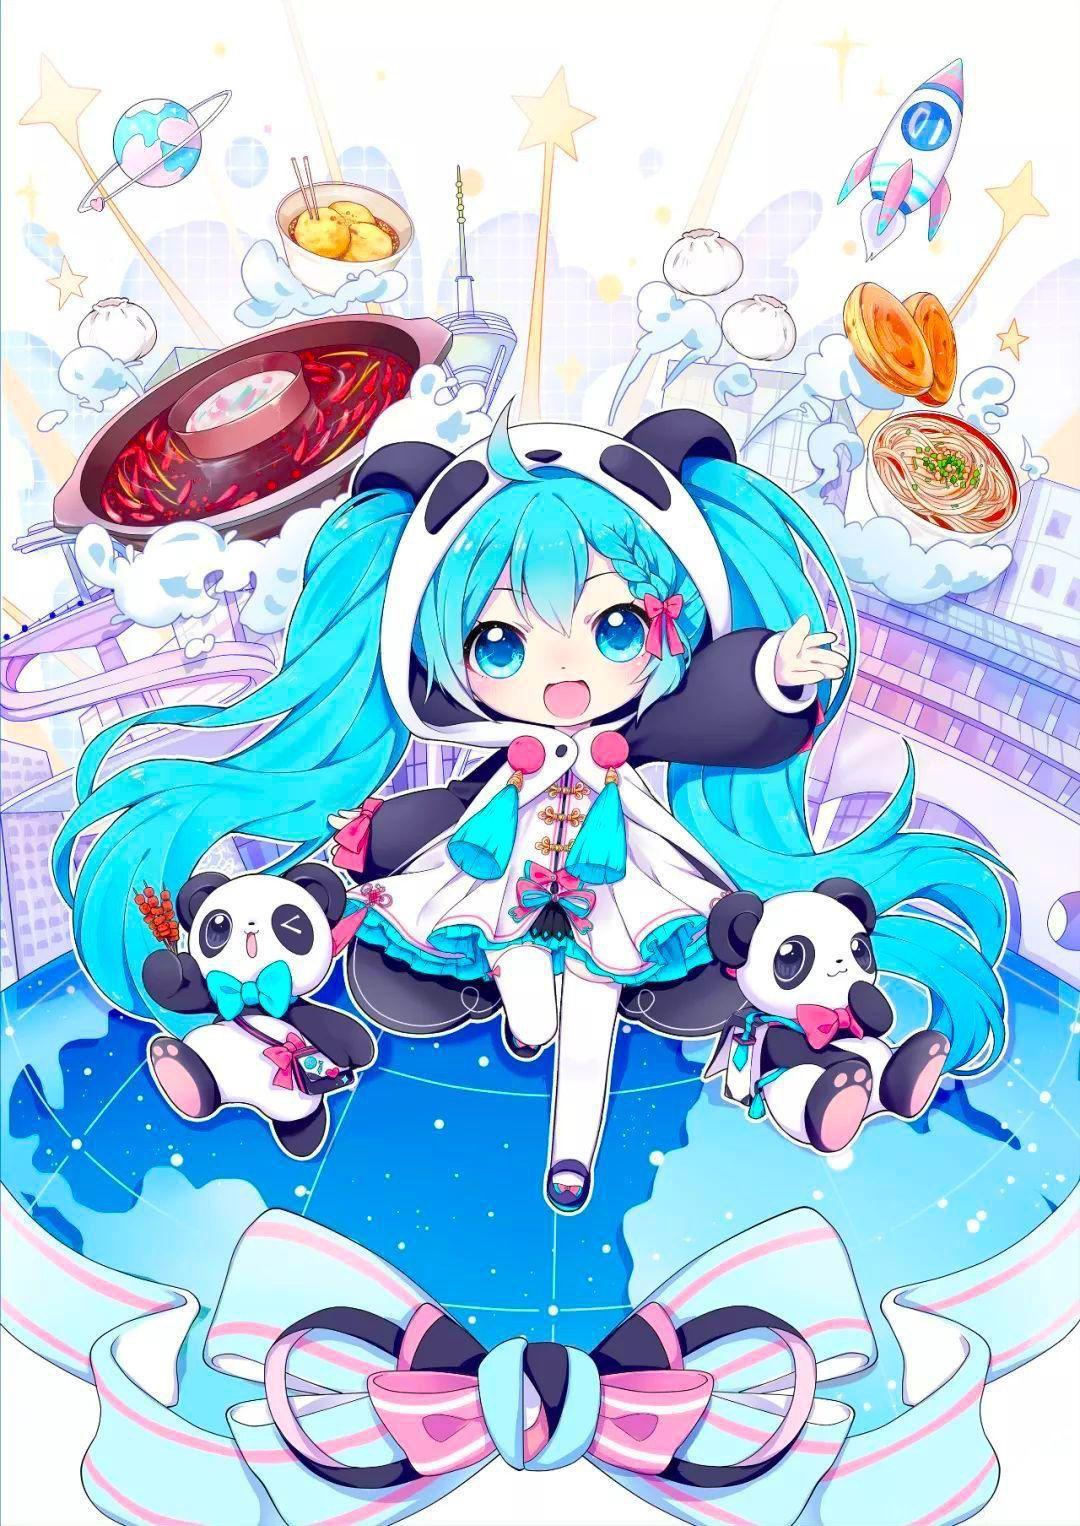 Miku Hatsune Vocaloid Hatsune Miku Vocaloid Anime